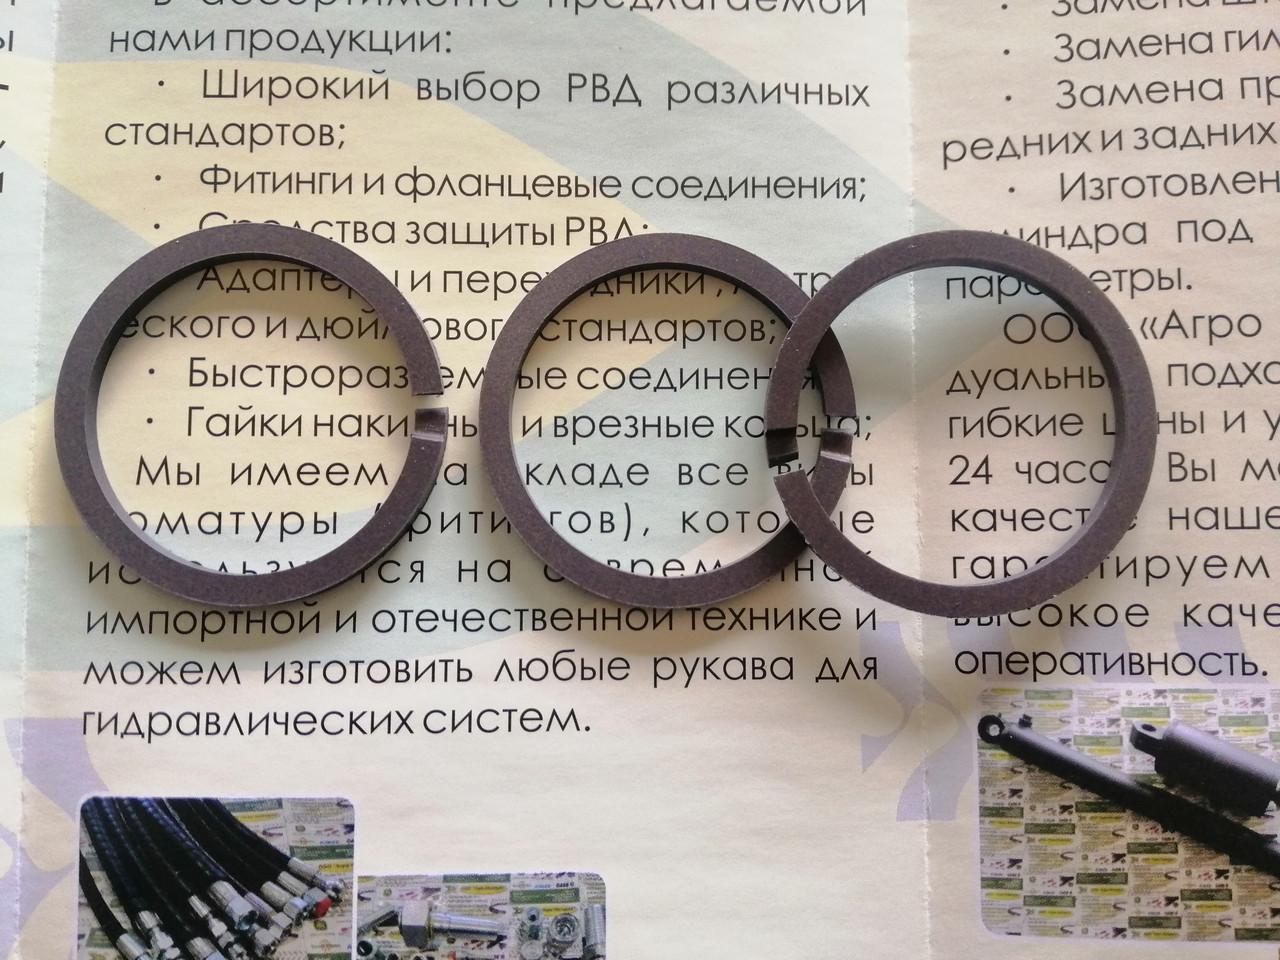 Кольцо тефлоновое АКПП разрезное ( 34mm x 40.8mm x 2.6mm)